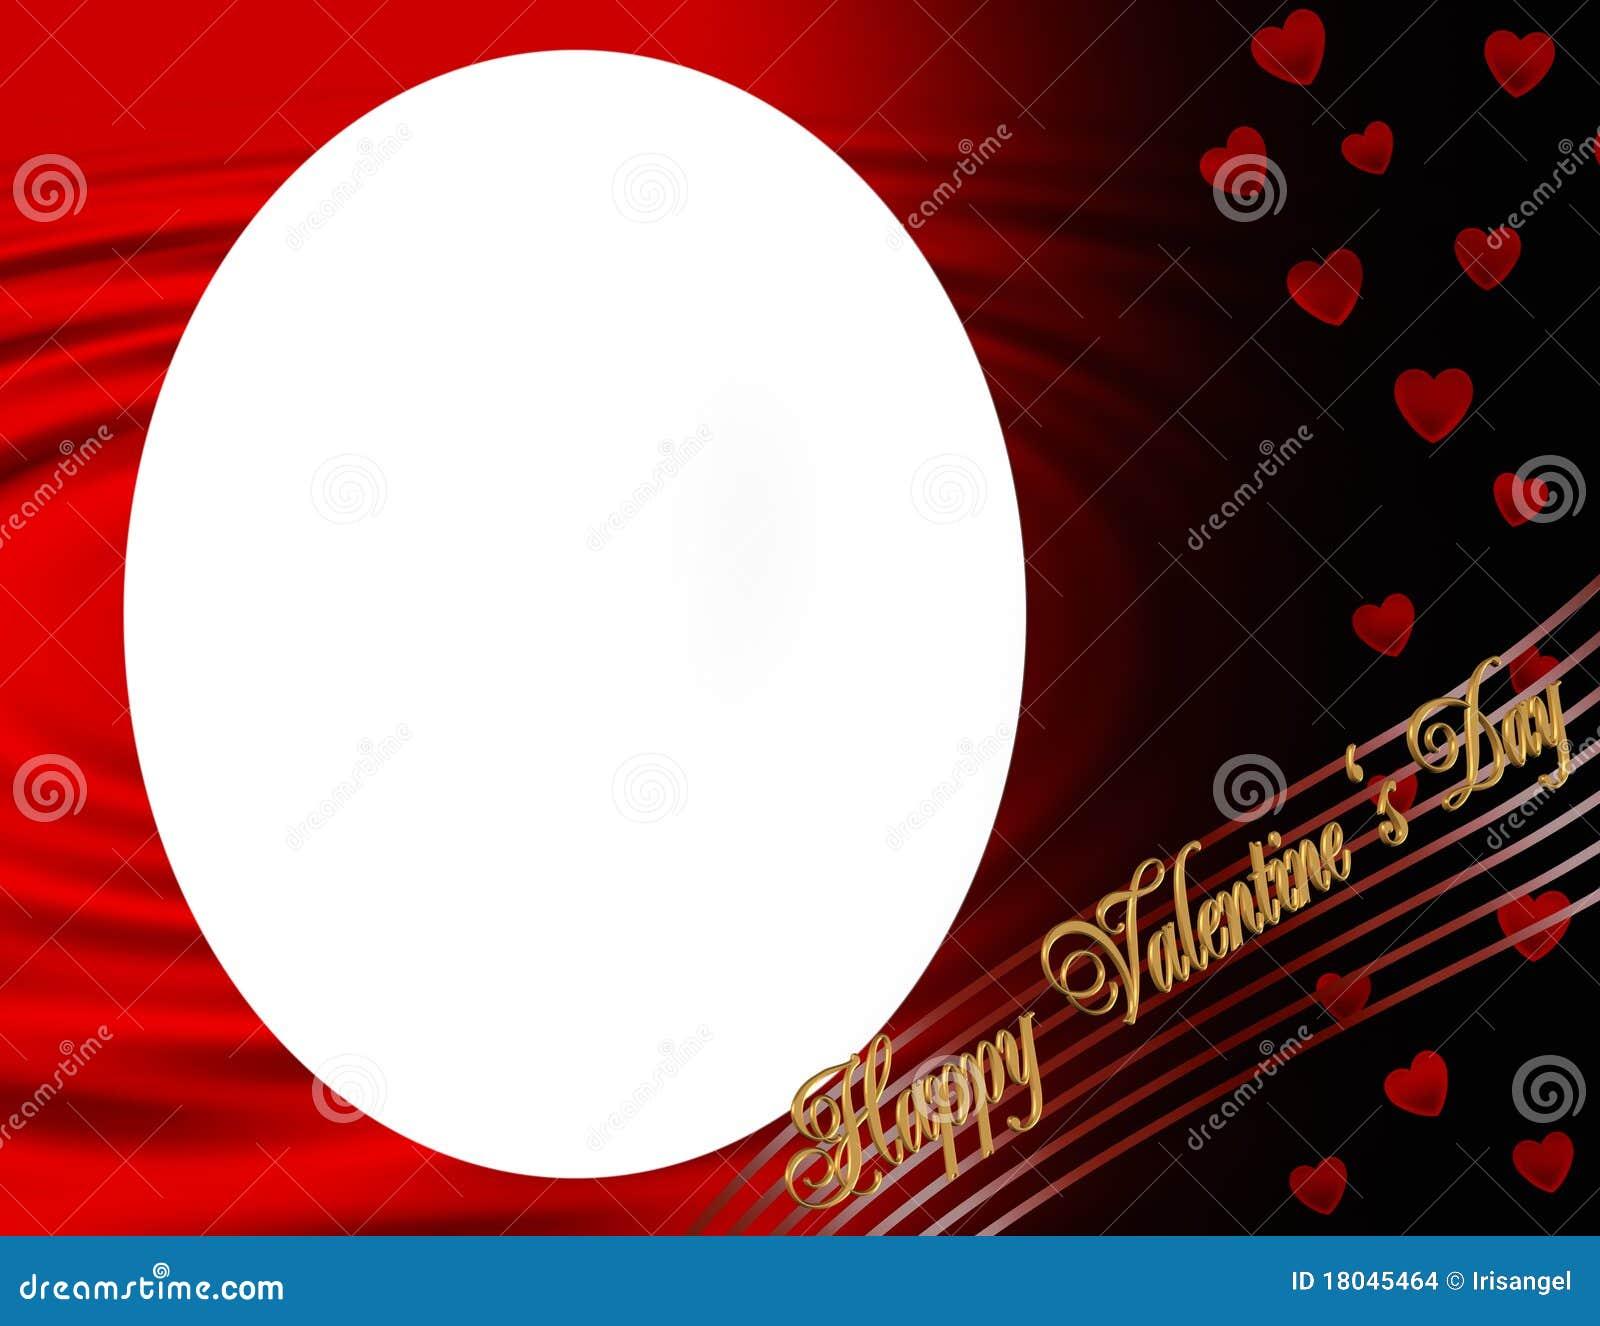 Valentine frame stock illustration. Illustration of holiday - 18045464